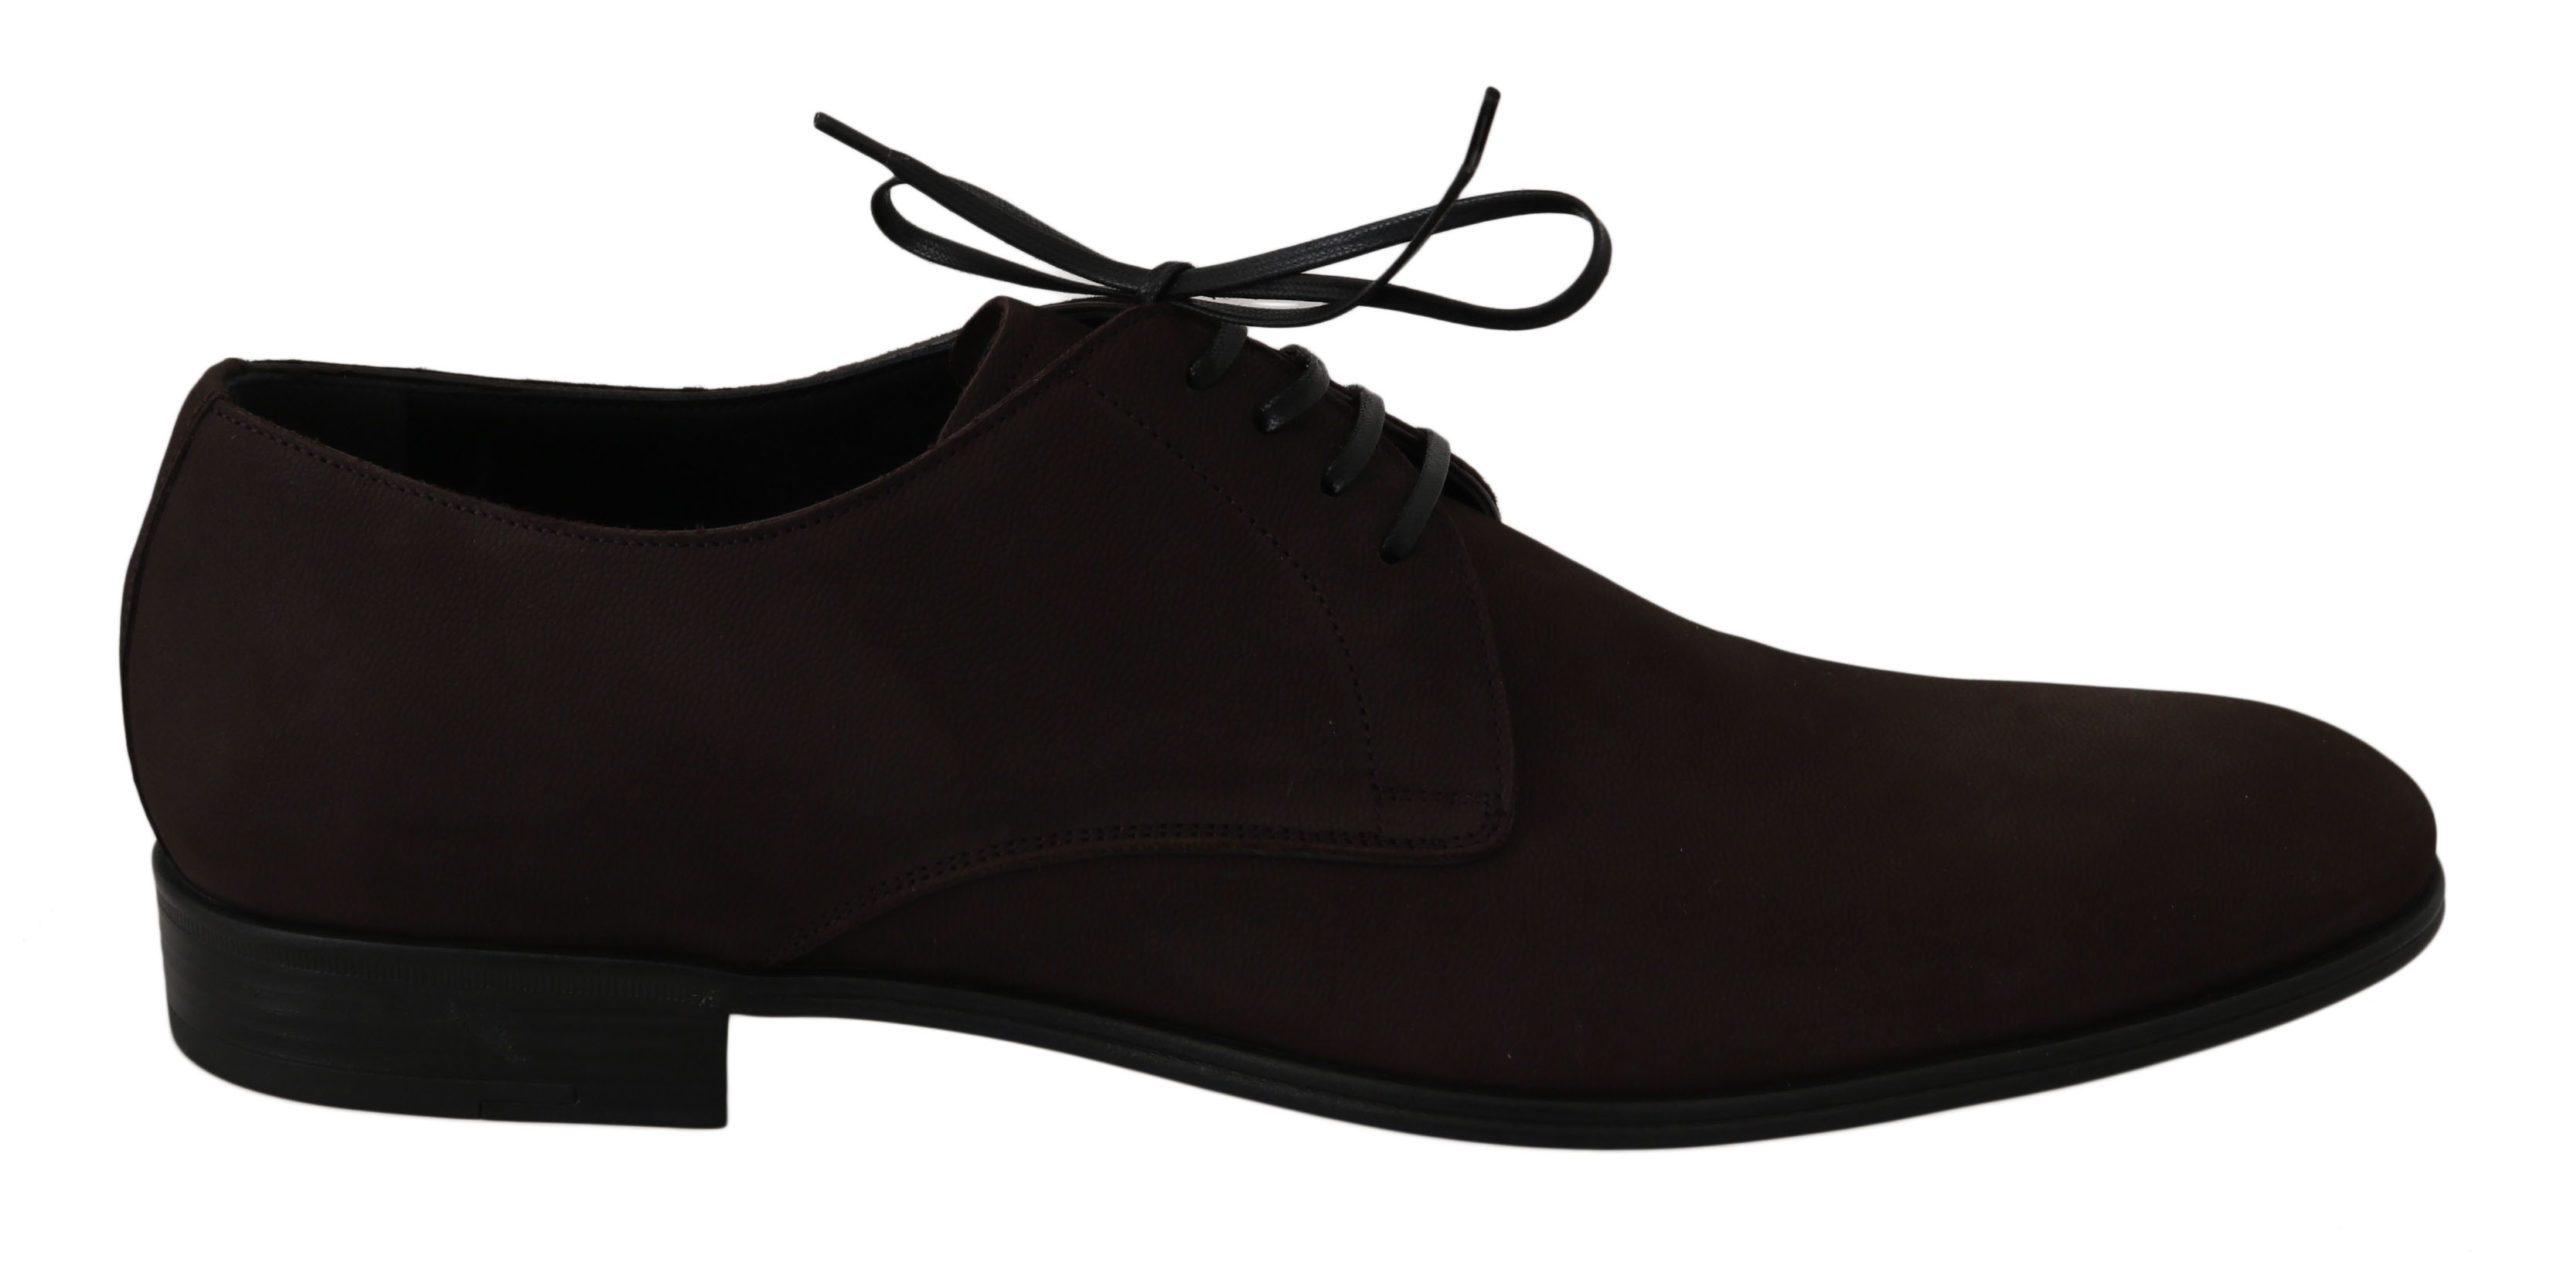 Dolce & Gabbana Men's Shoes Brown MV2368 - EU40/US7